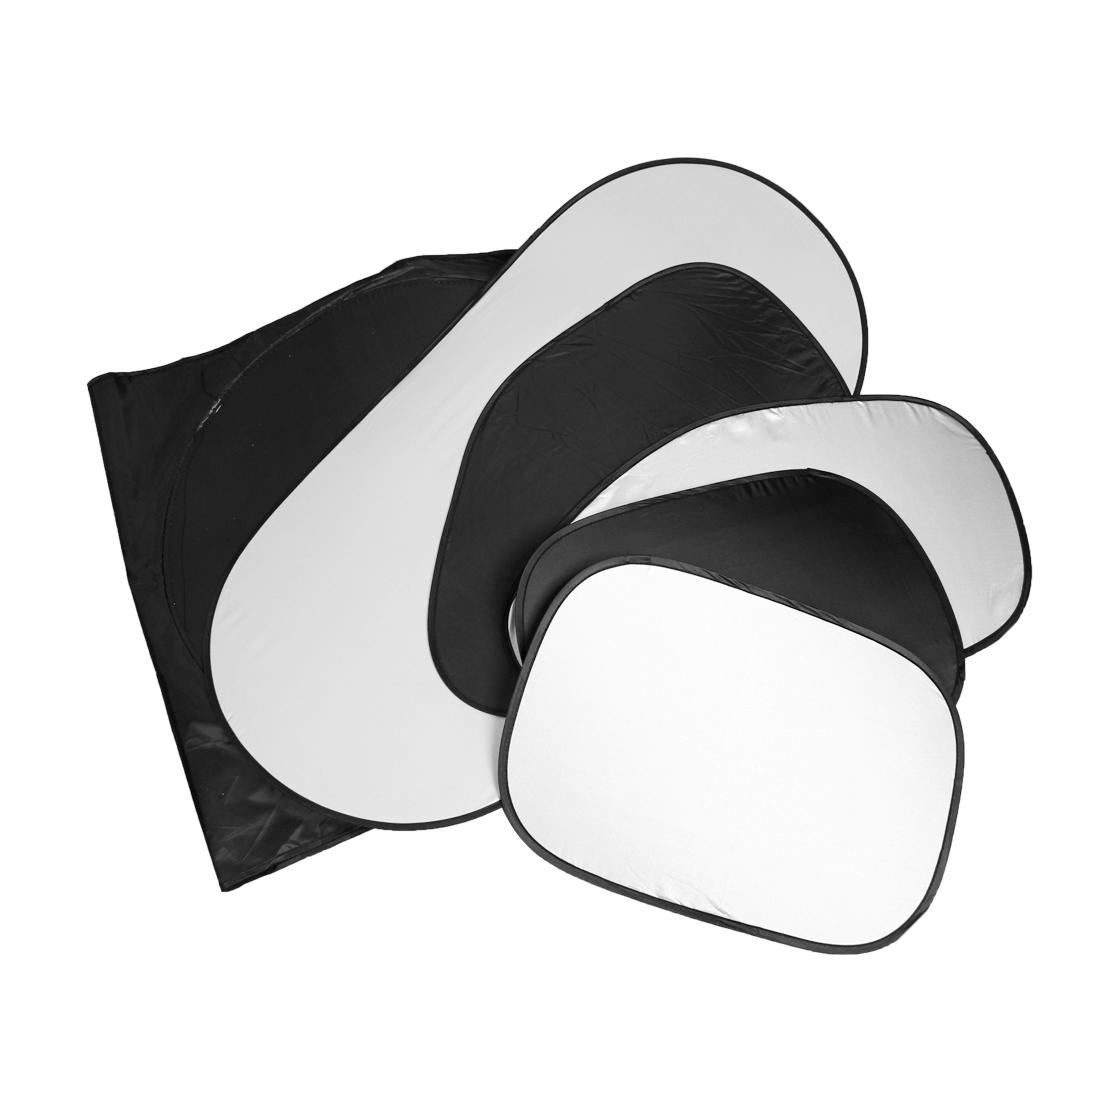 6 in 1 Silver Tone Black Windshield Window Sun Shield Sunshield for Car